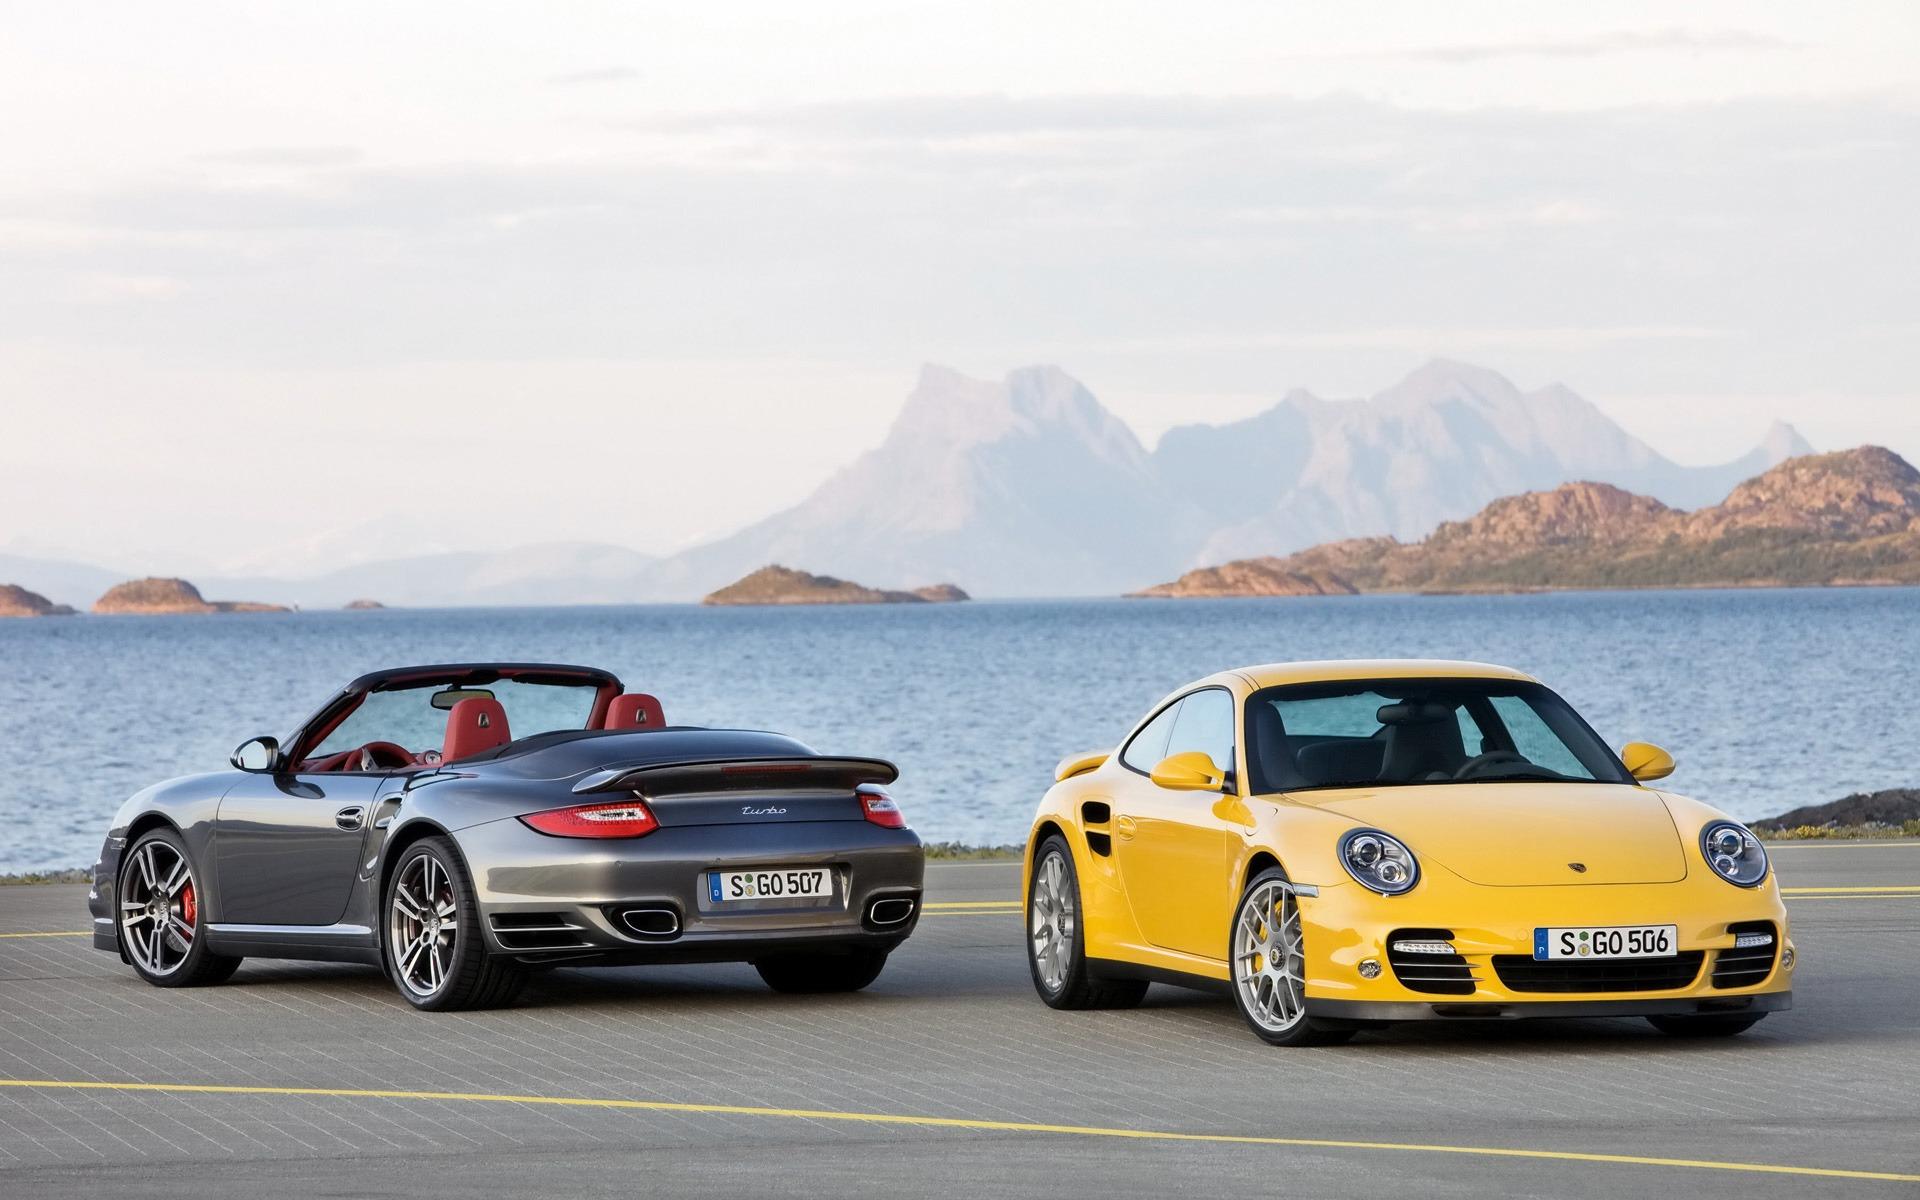 porsche 911 turbo wallpaper porsche cars wallpapers in jpg format